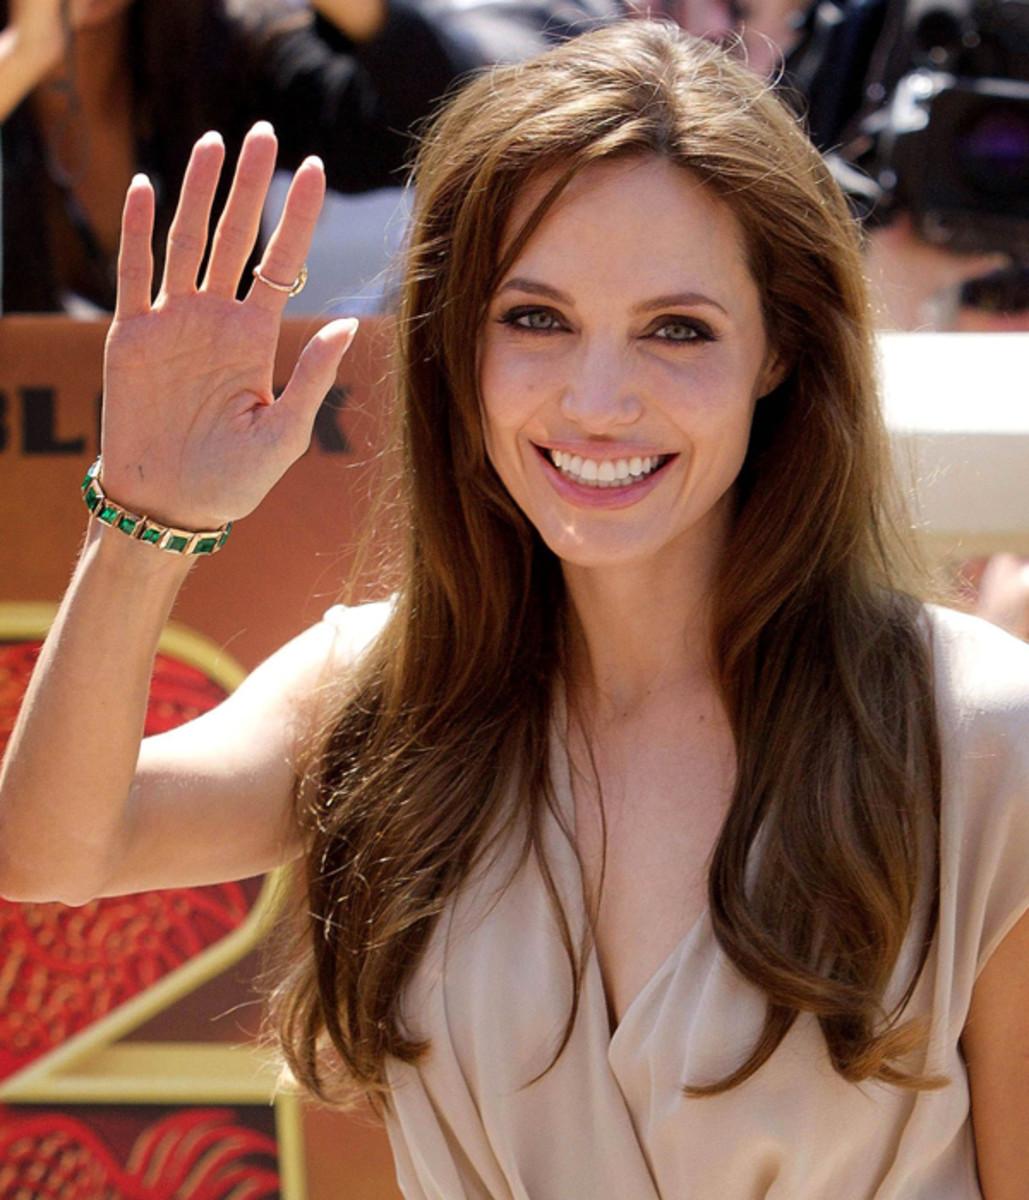 Angelina-Jolie-Kung-Fu-Panda-photocall-Cannes-2011